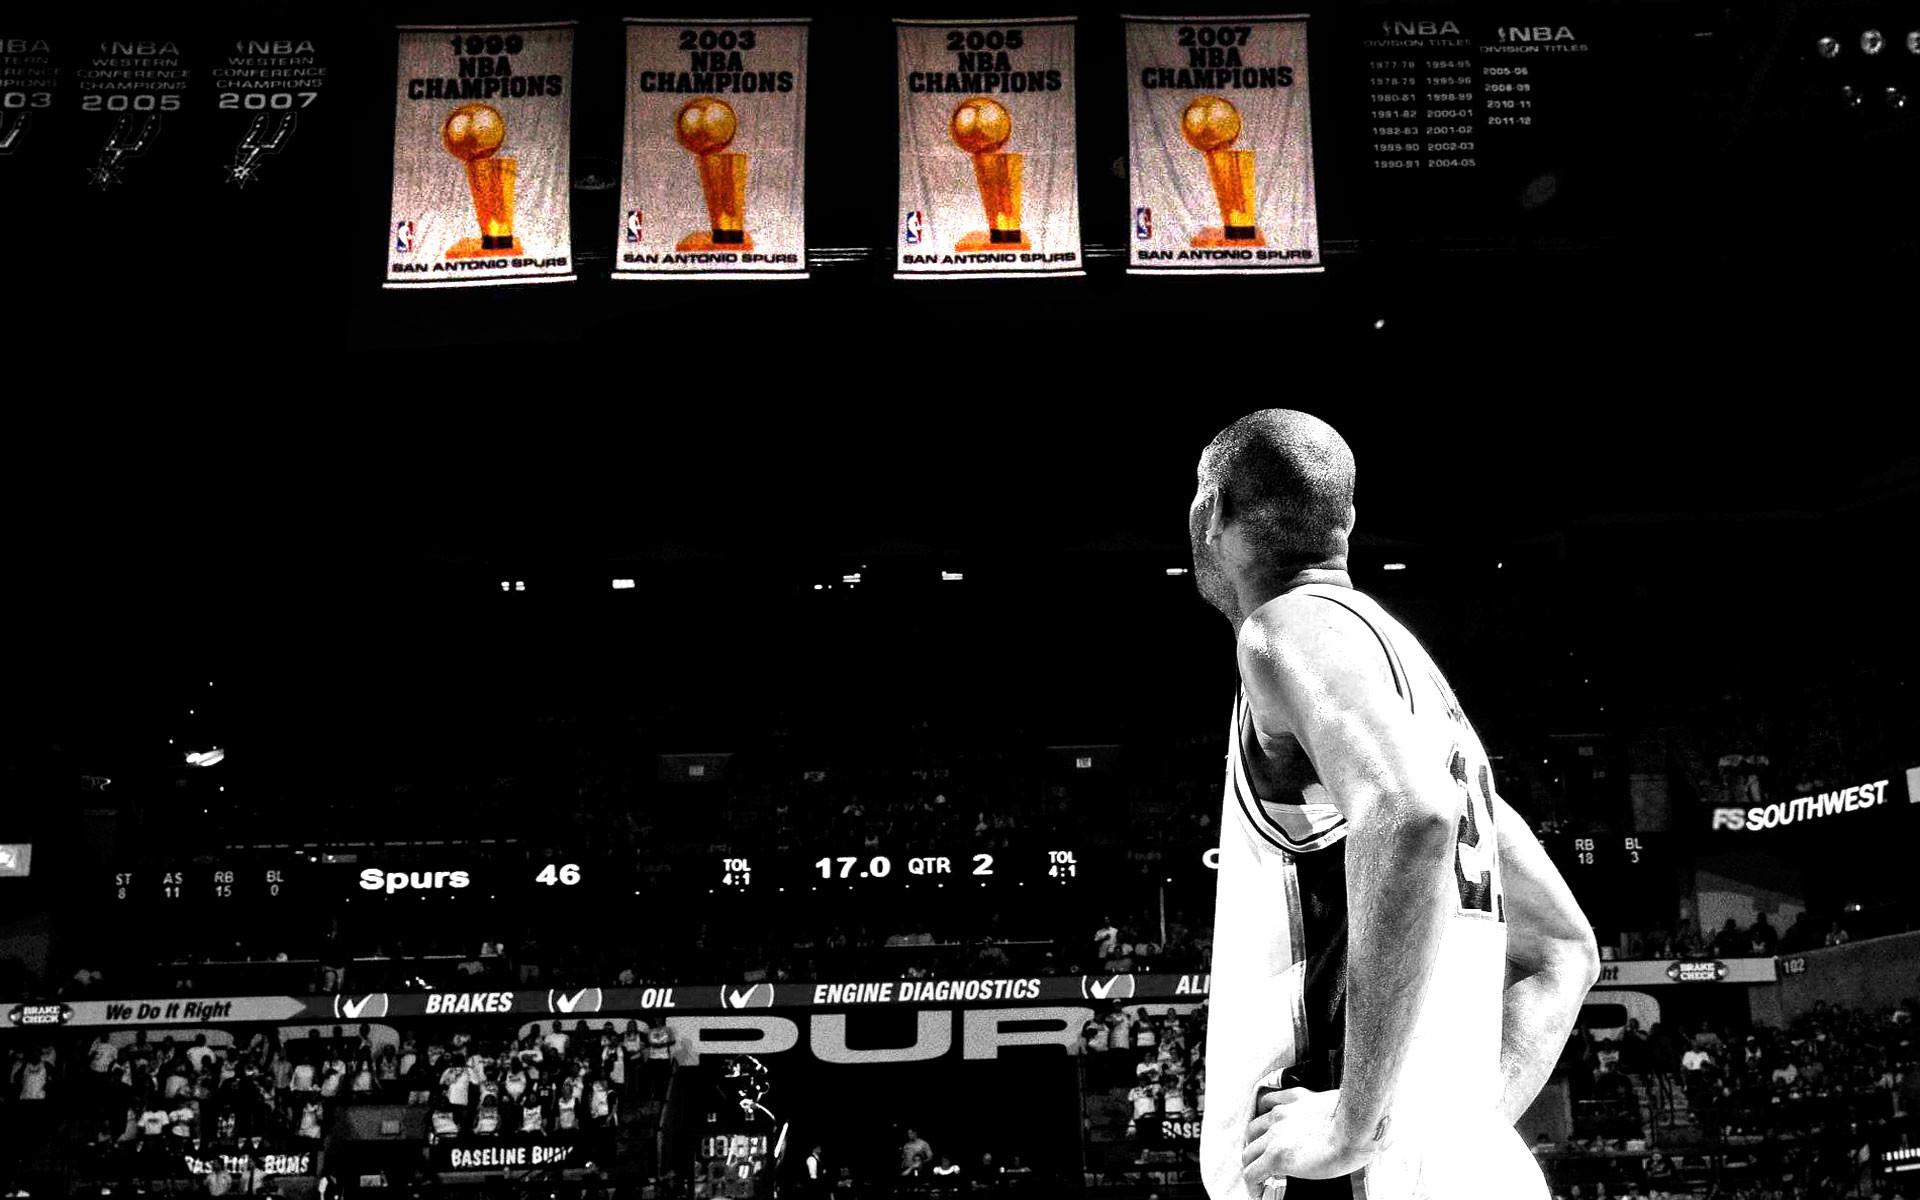 Tim Duncan Spurs Championship Banners Wallpaper